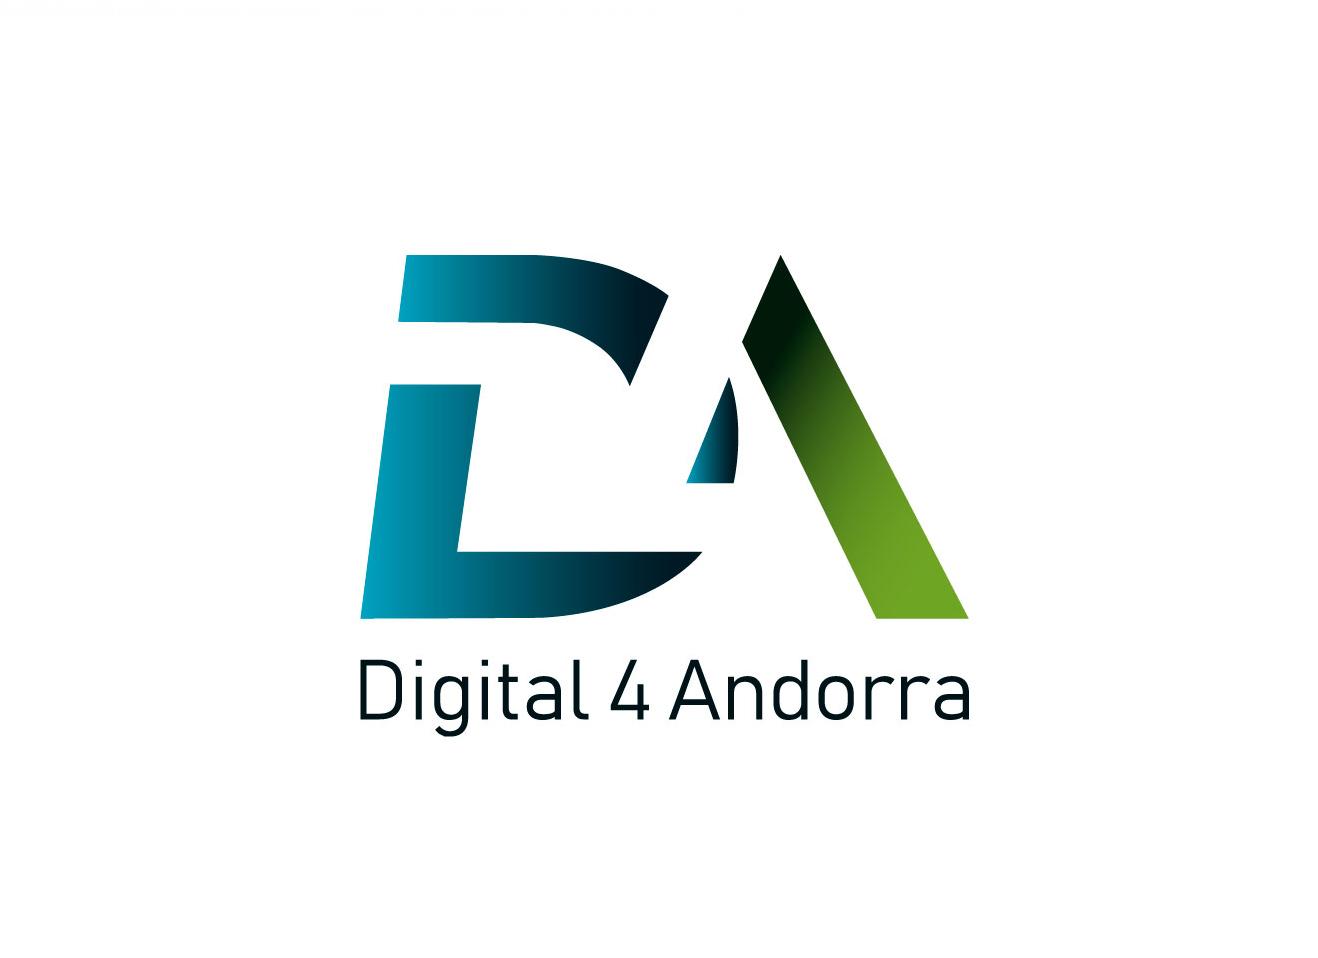 Digital 4 Andorra